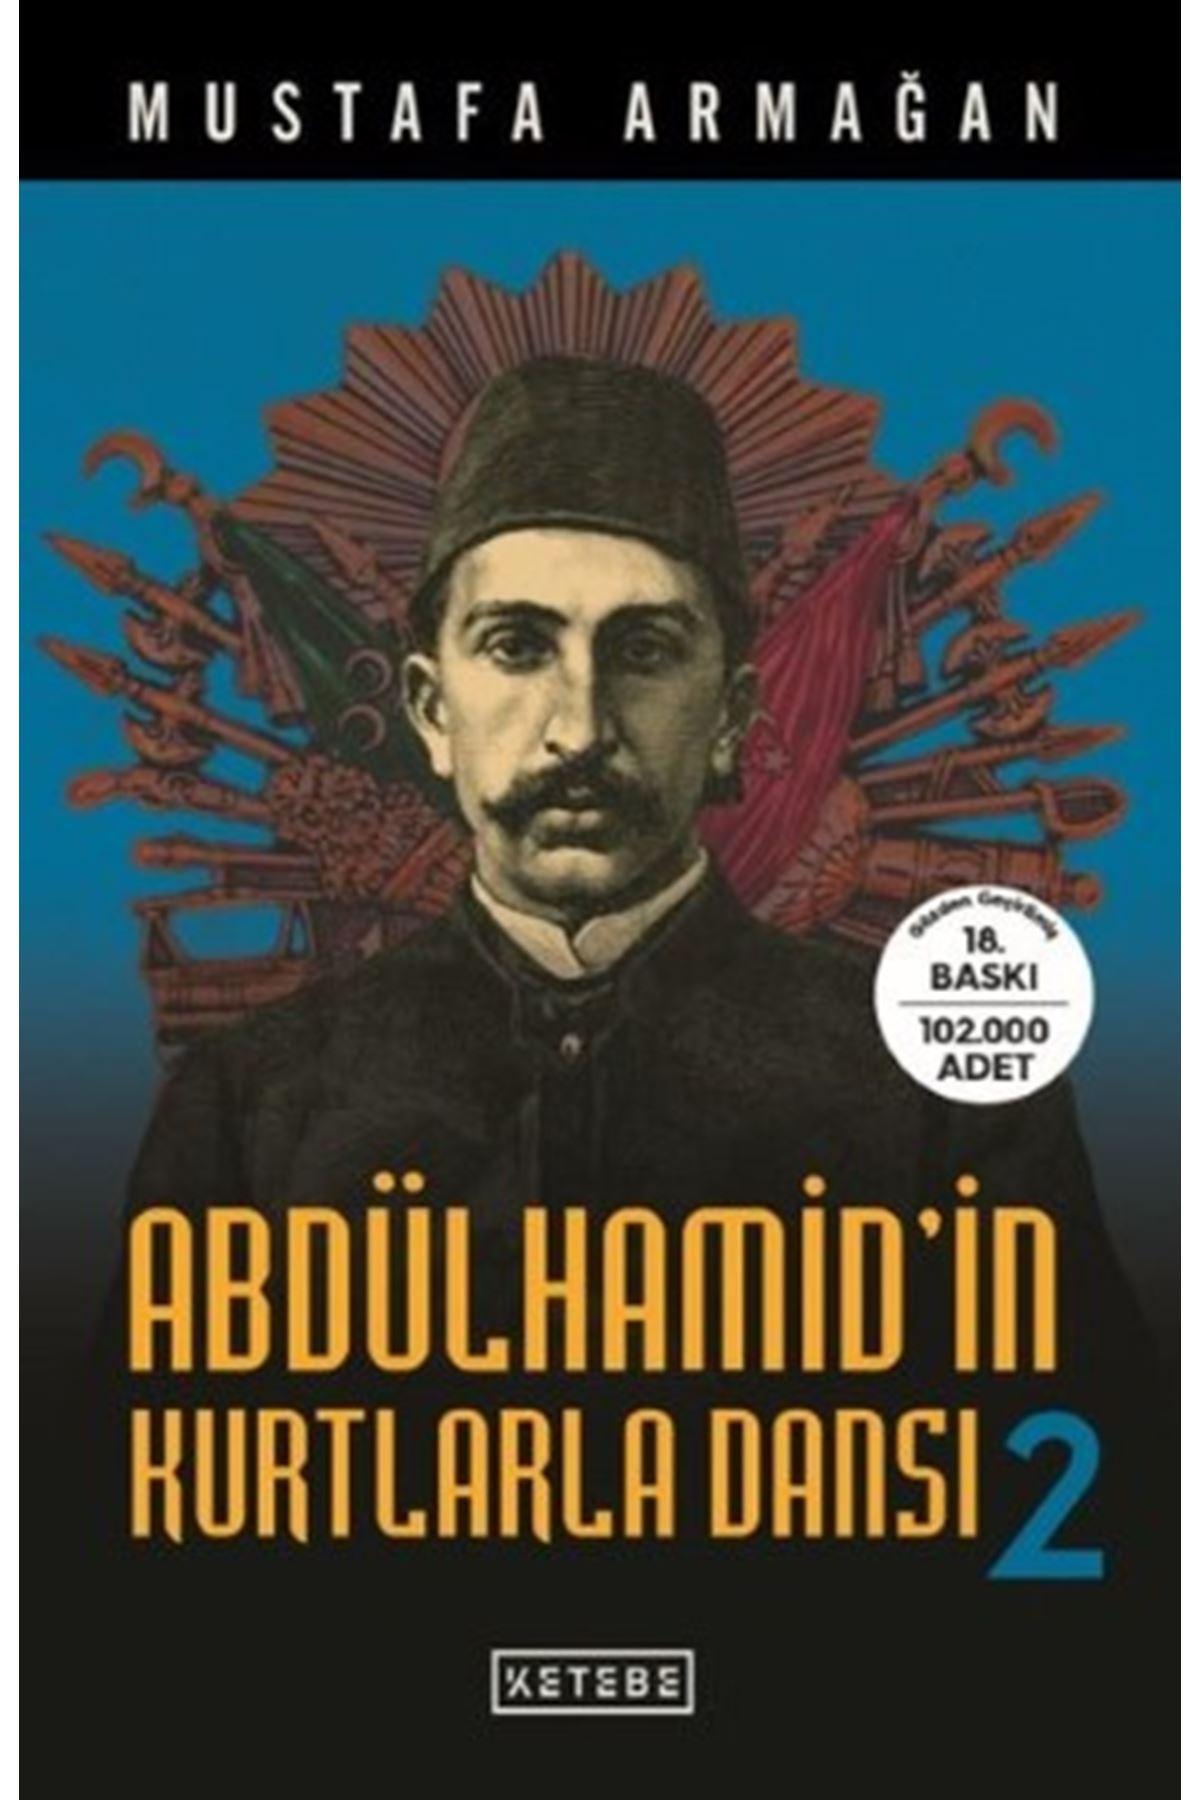 MUSTAFA ARMAĞAN - ABDÜLHAMİD'İN KURTLARLA DANSI 2